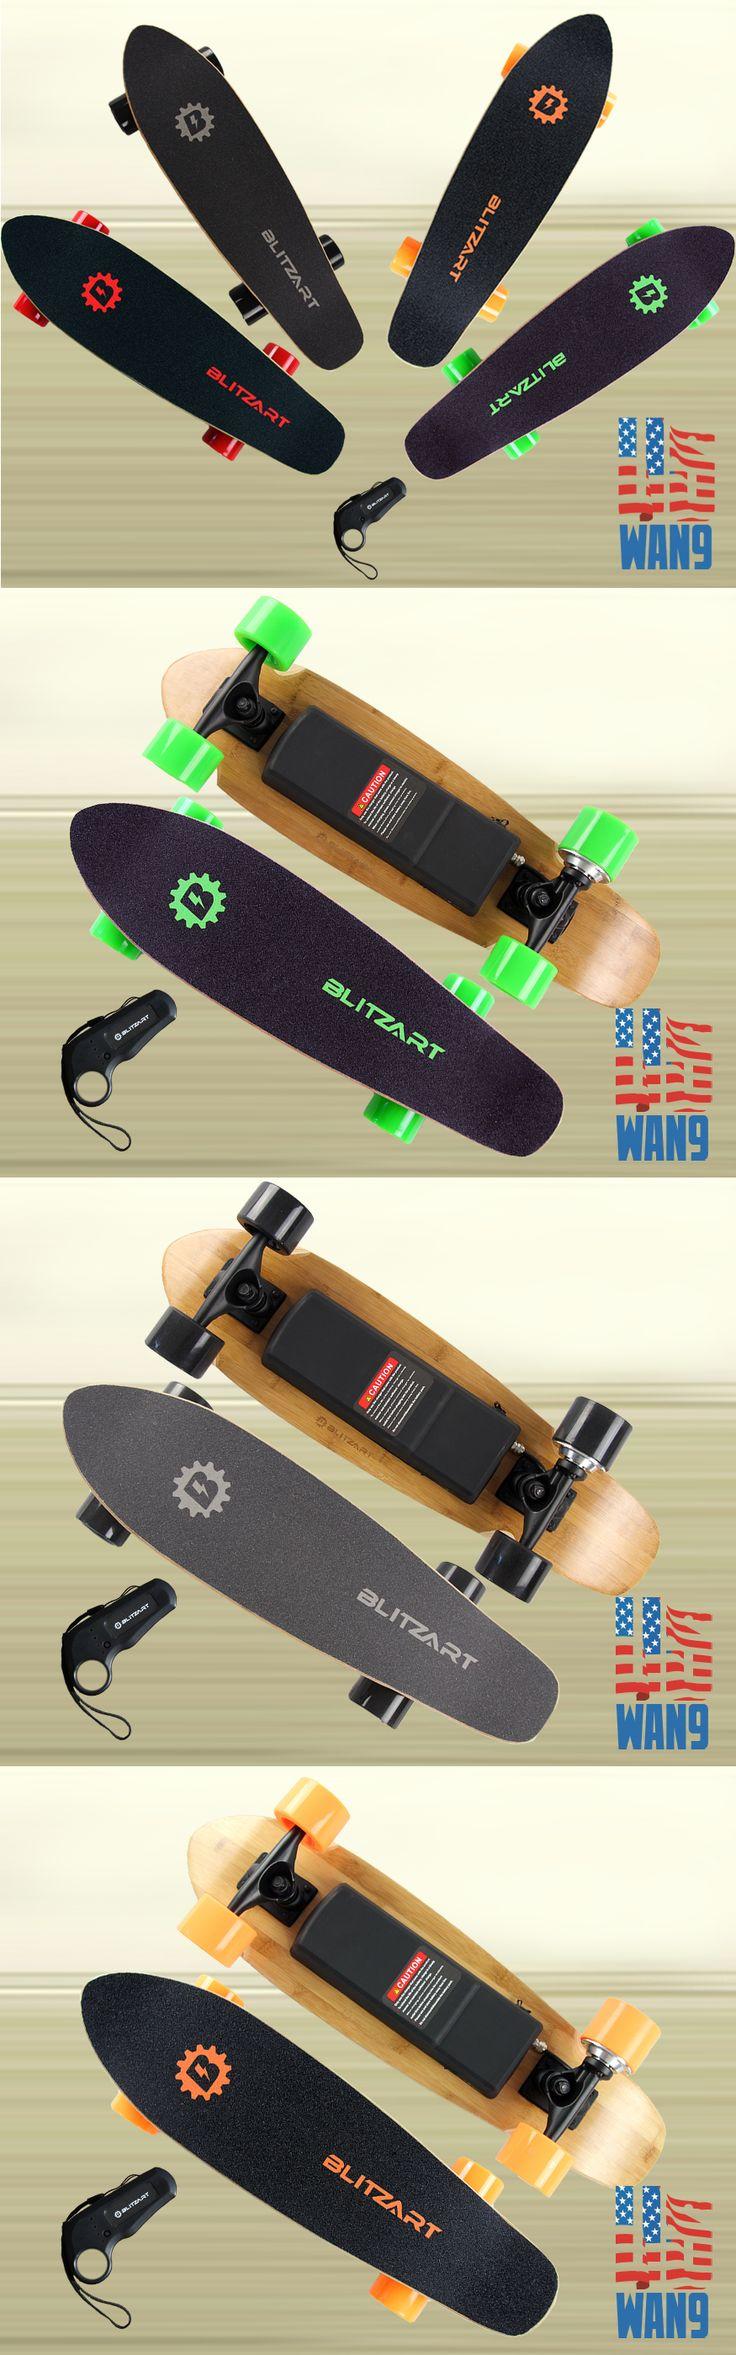 Longboards-Complete 165942: Cruiser Board Electric Skateboard Wireless Remote Control Hub Boost Motor Wheel -> BUY IT NOW ONLY: $177.5 on eBay!